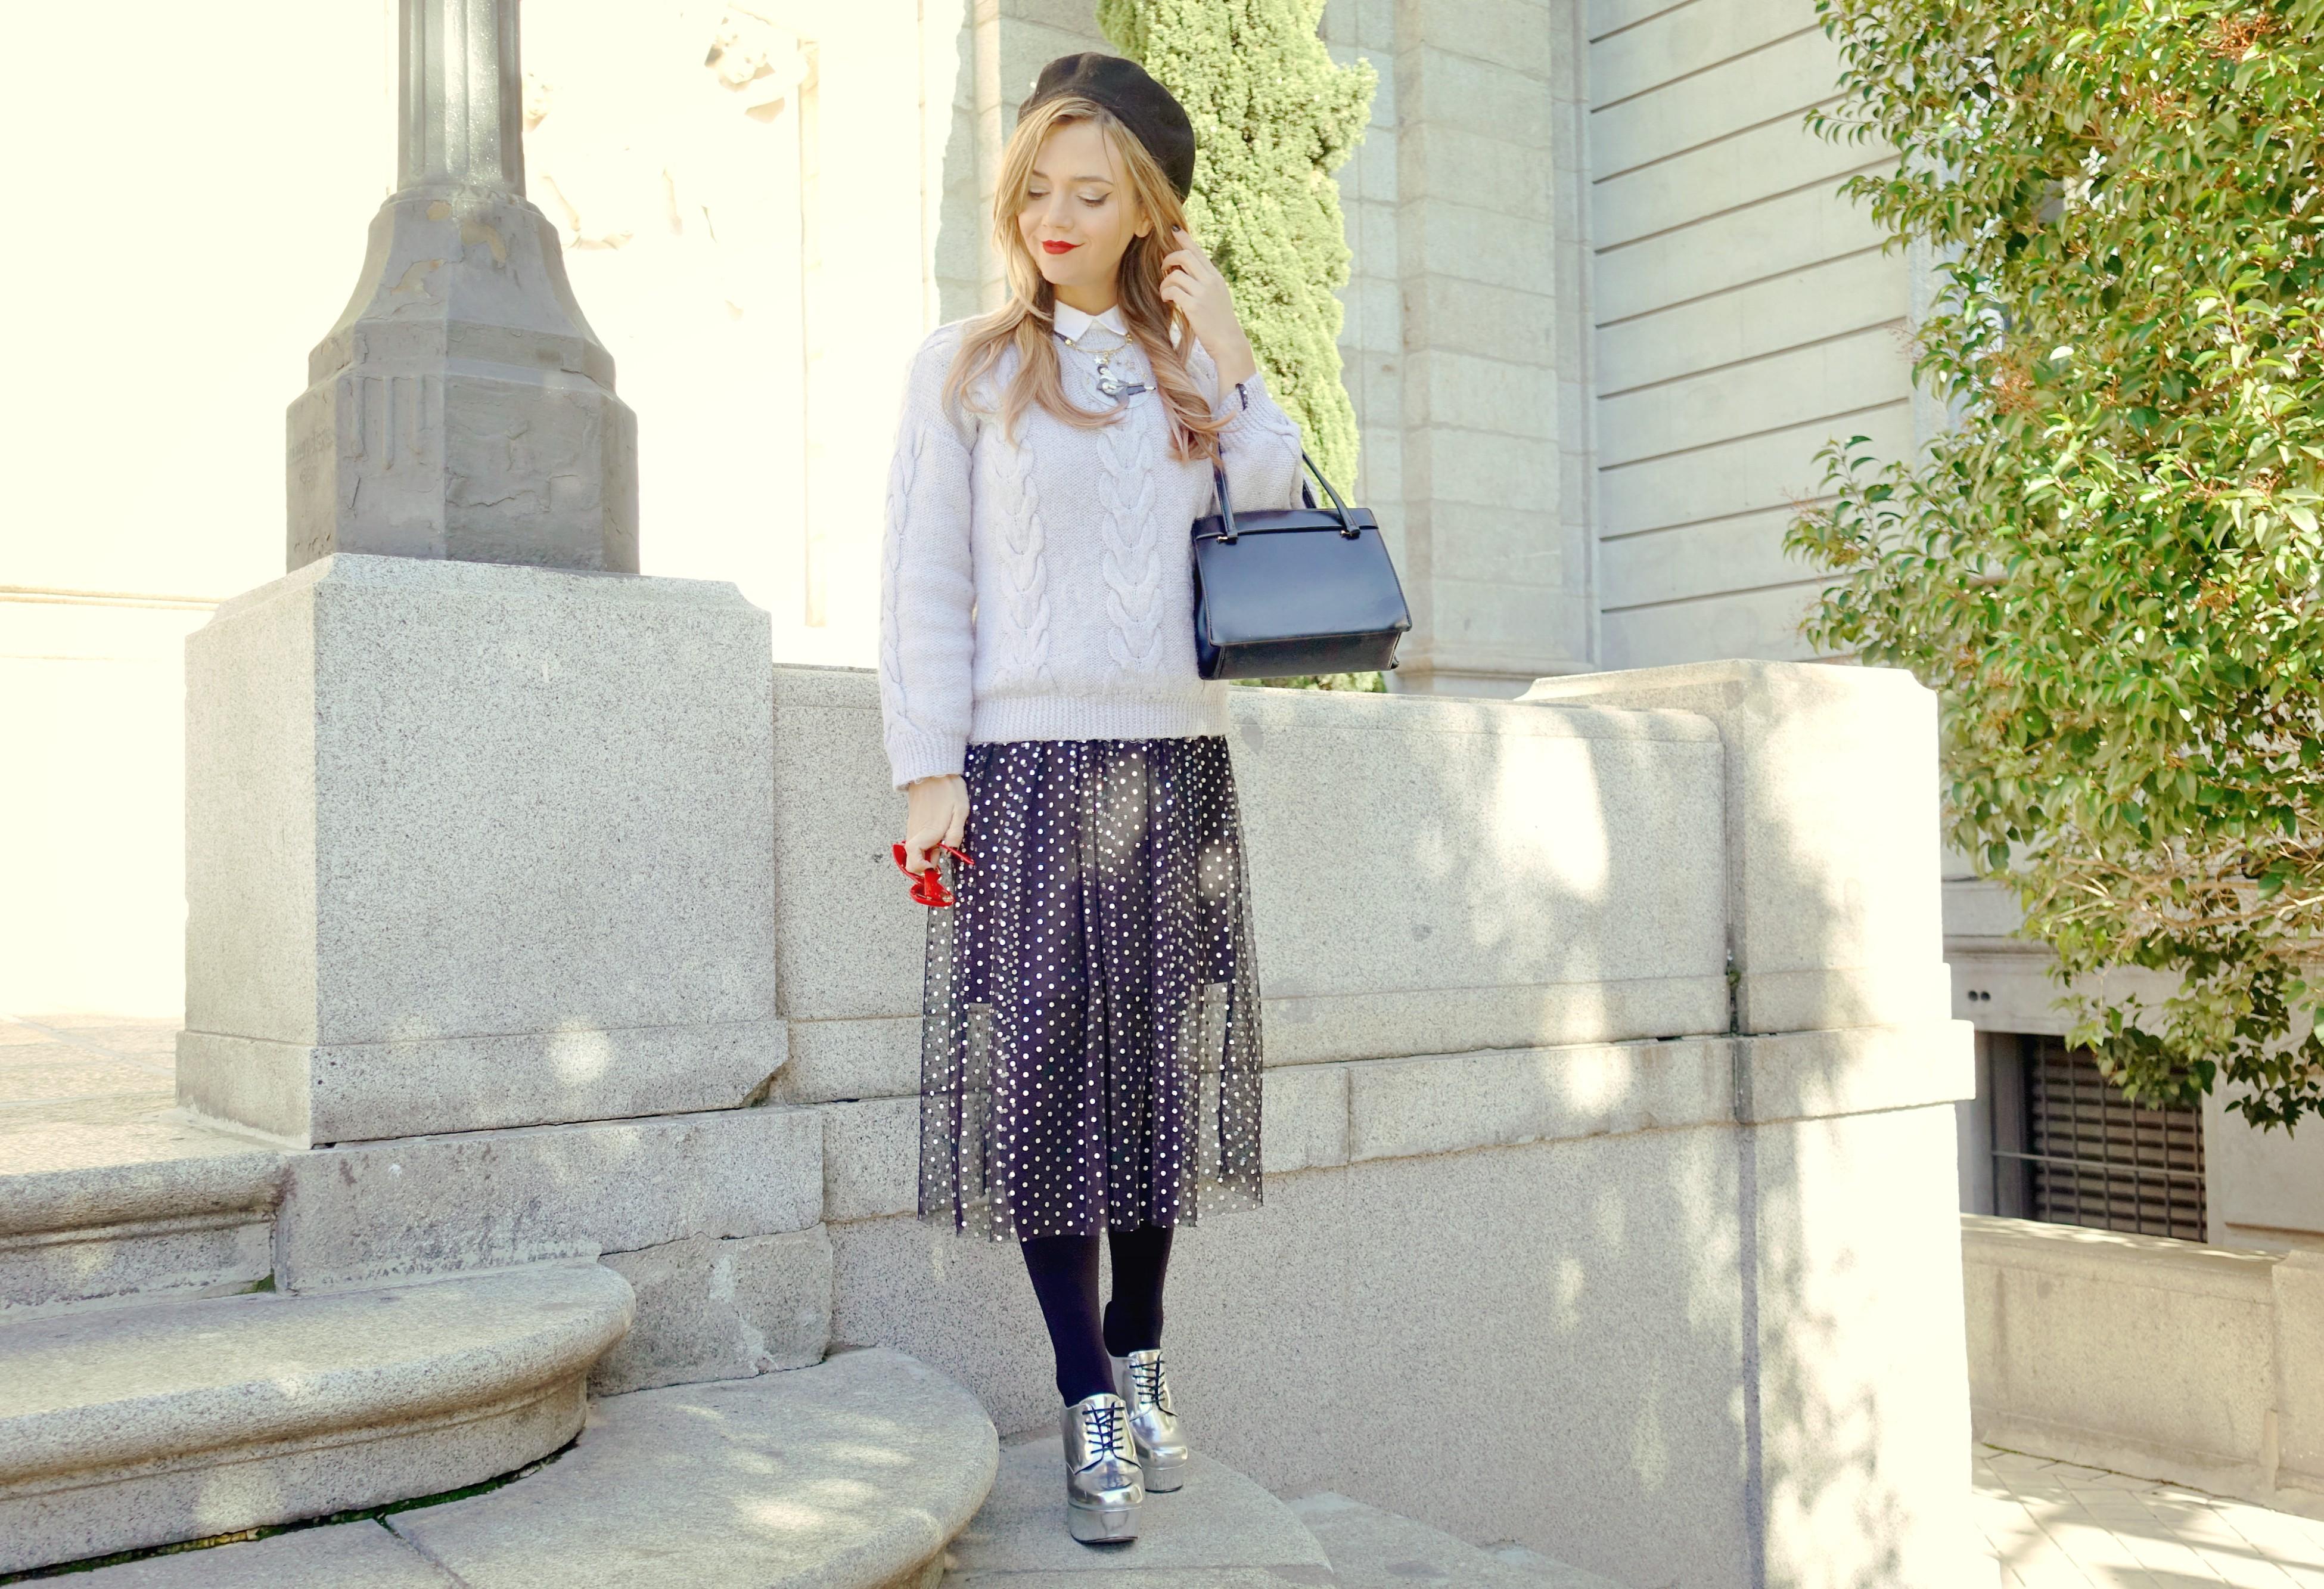 Fashionista-blog-de-moda-ChicAdicta-laliblue-joyeria-artesanal-retro-look-Chic-Adicta-influencer-Madrid-PiensaenChic-Piensa-en-Chic